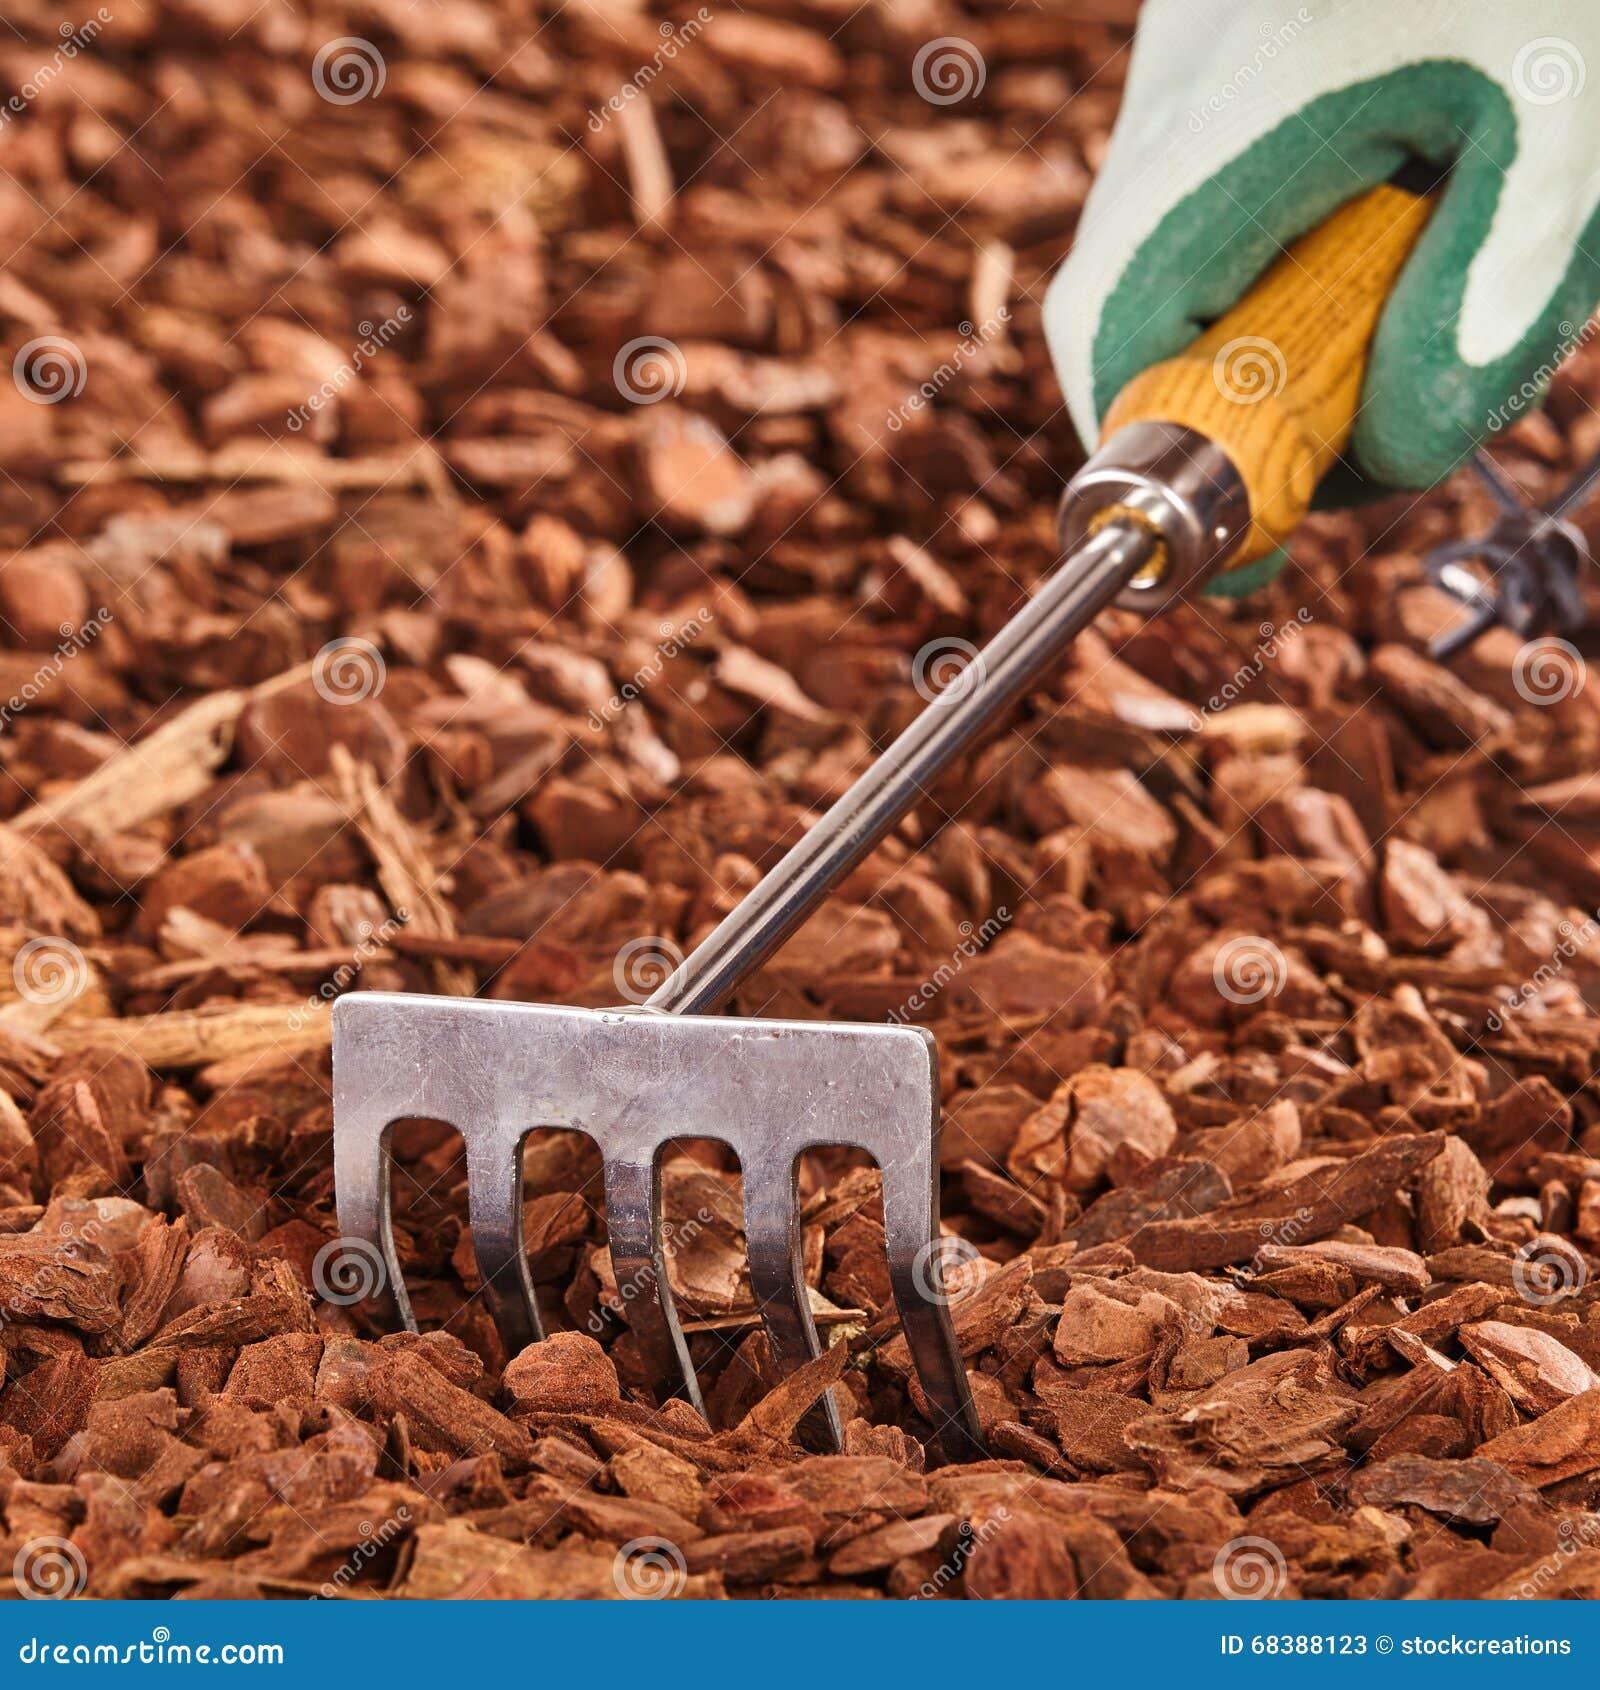 Hand held garden rake over wood chips stock photo image